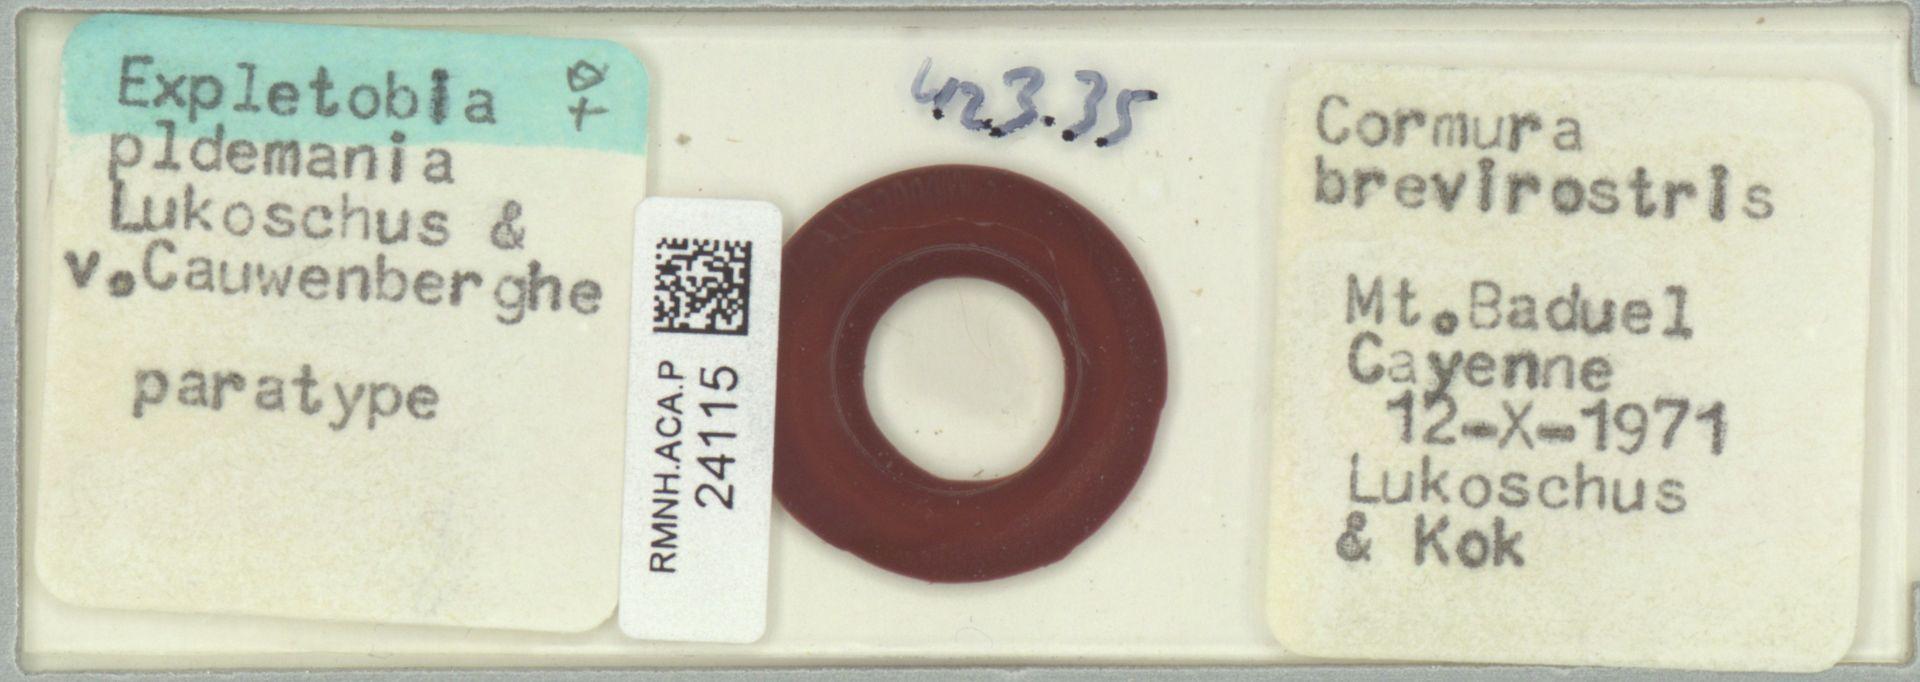 RMNH.ACA.P.24115 | Expletobia oldemania Lukoschus & v. Cauwenberghe